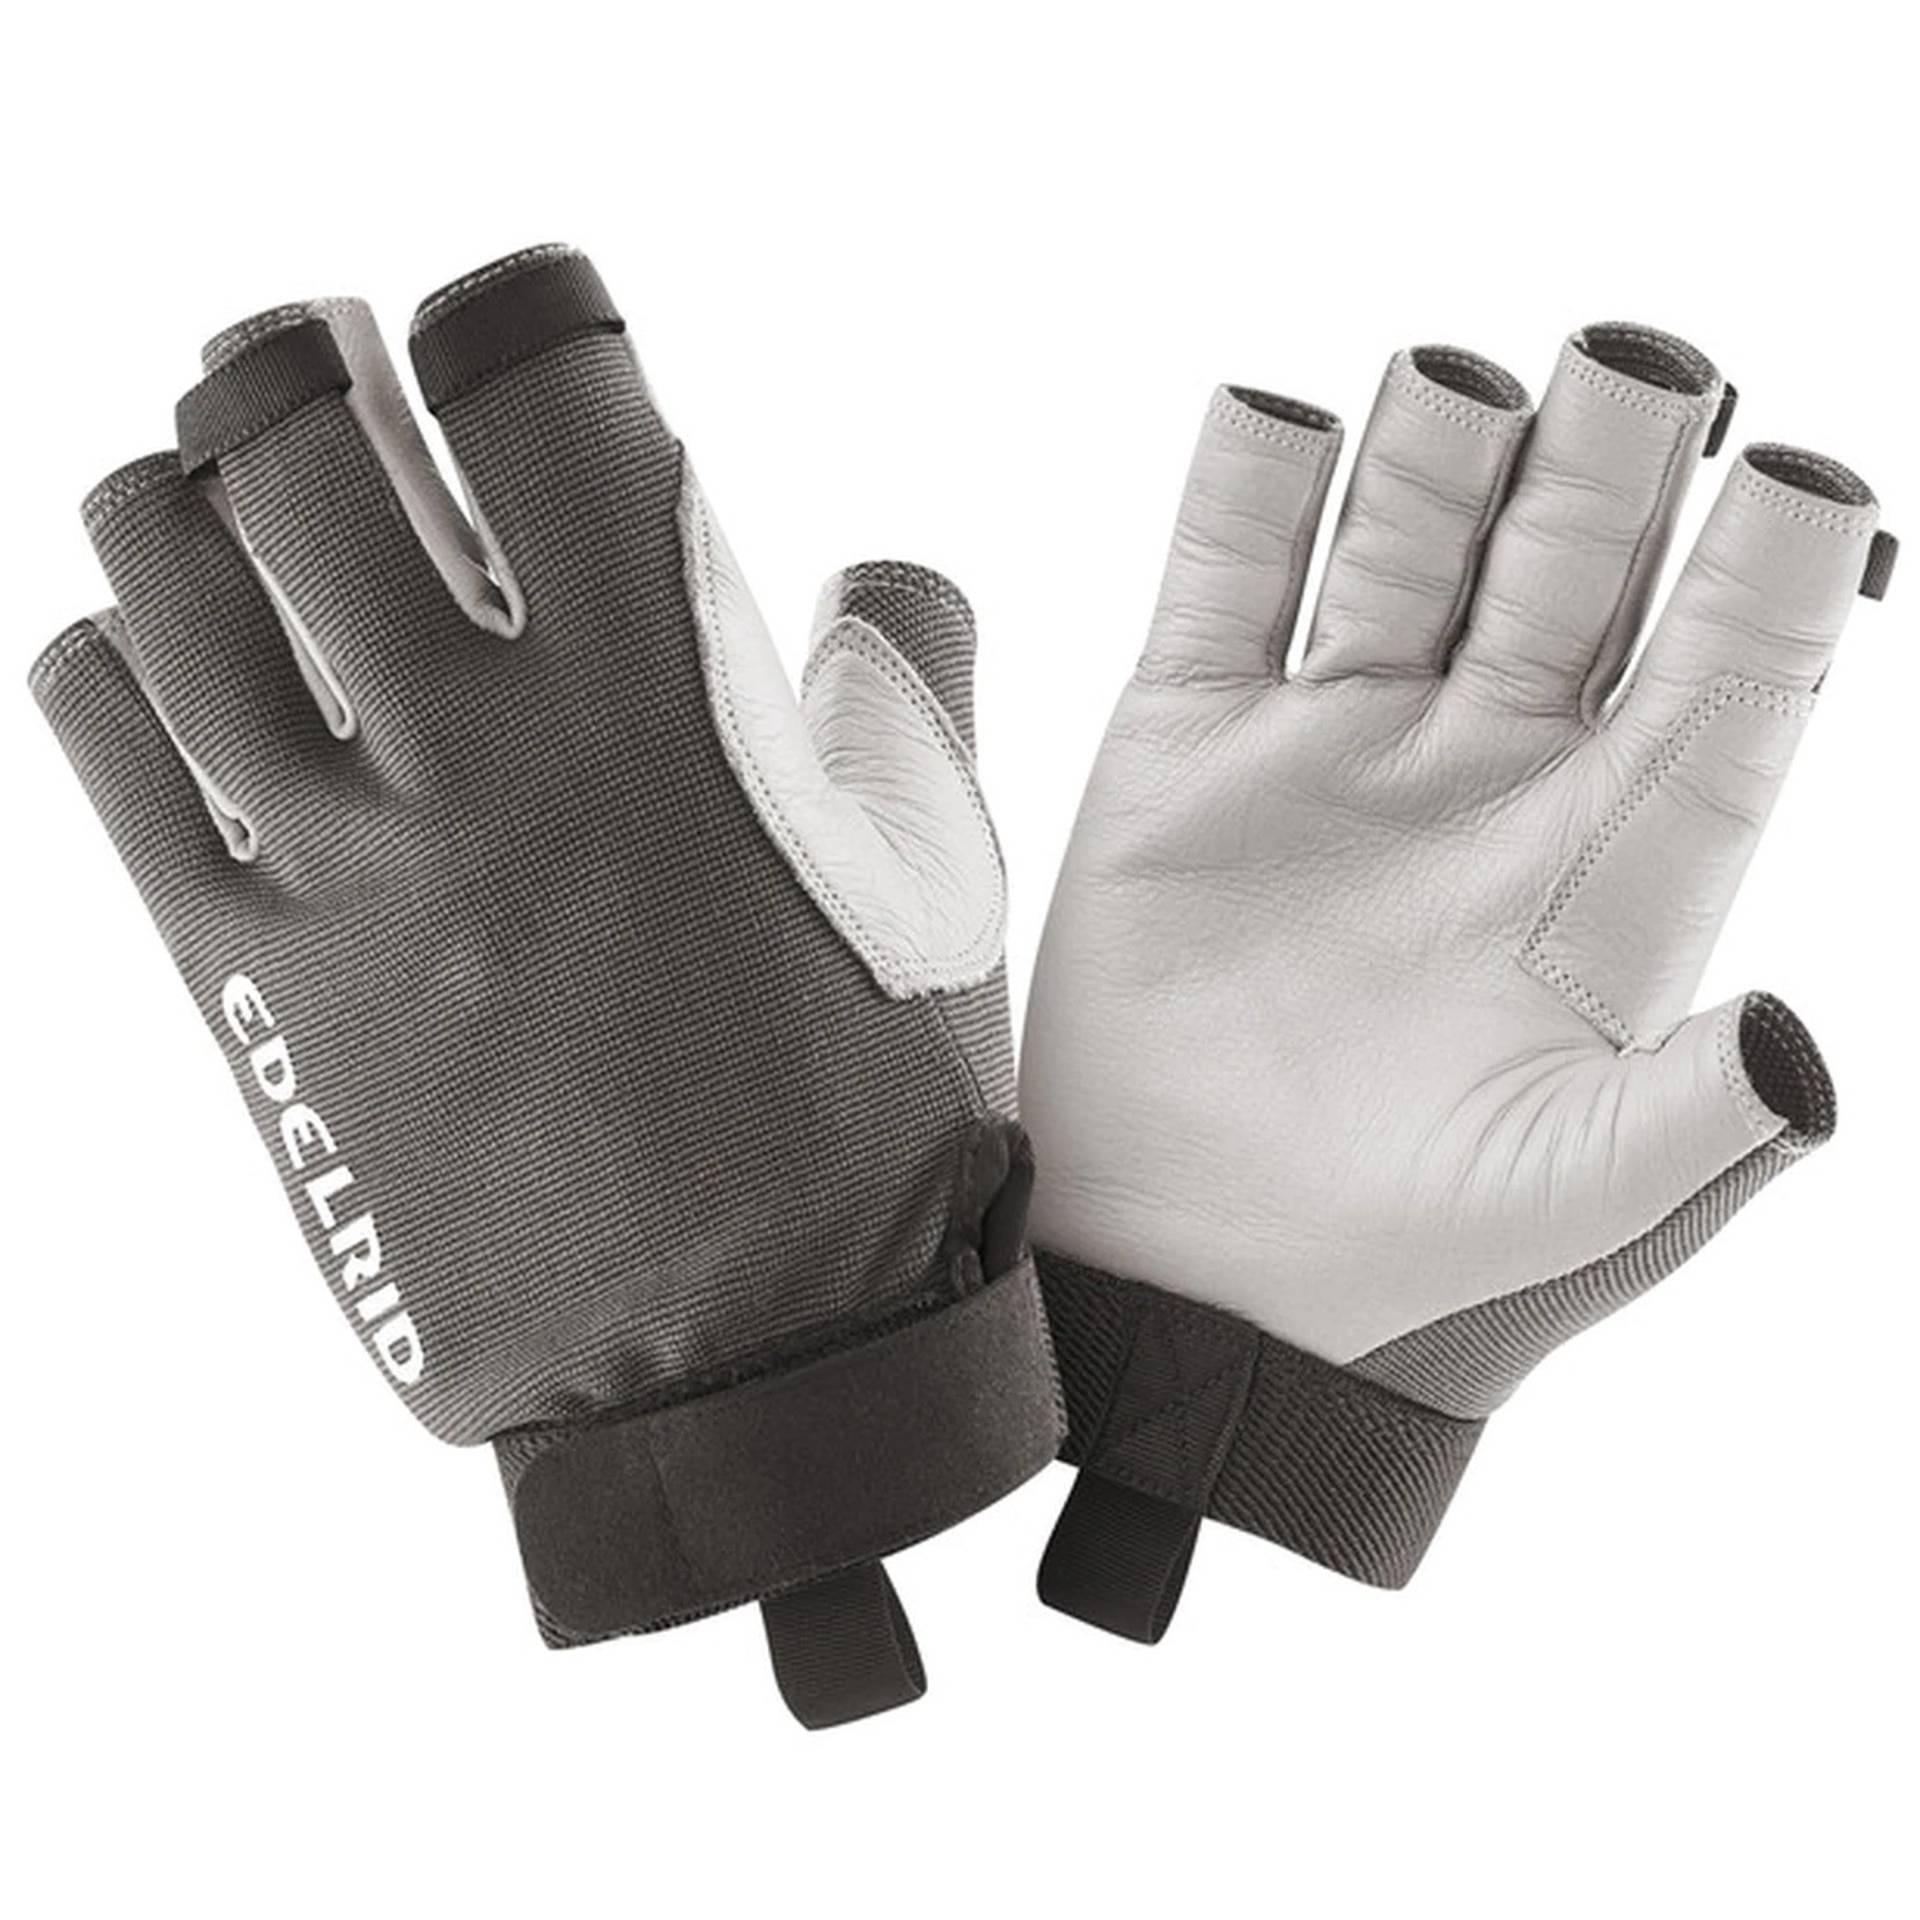 image of Edelrid Titan Work Glove - Open